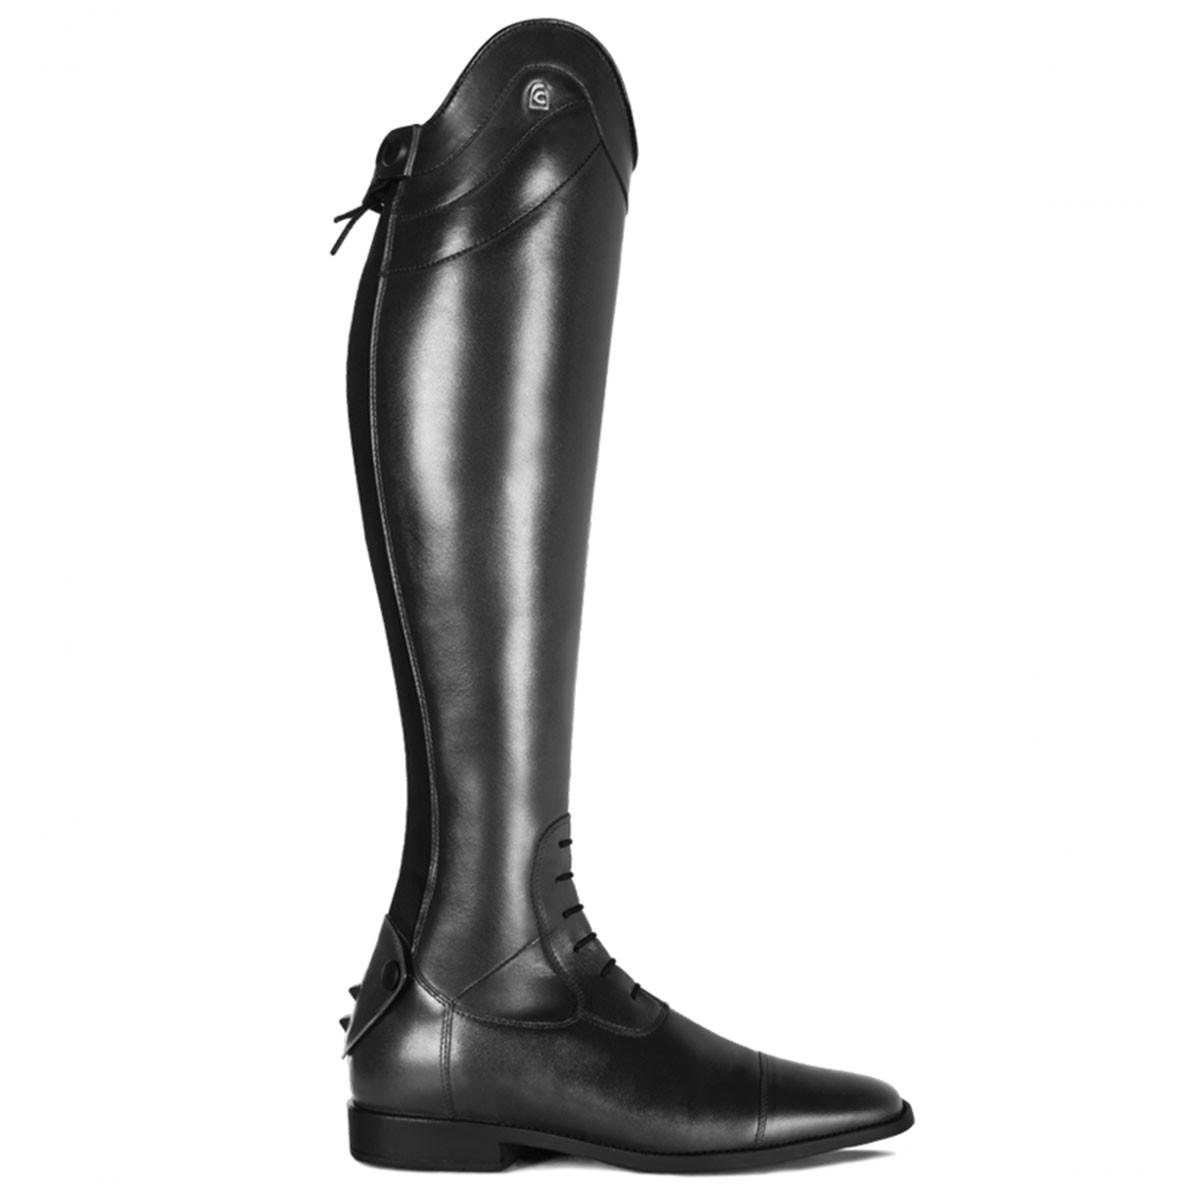 Cavallo Linus Slim rijlaars zwart maat:5-5.5 / h50-w33